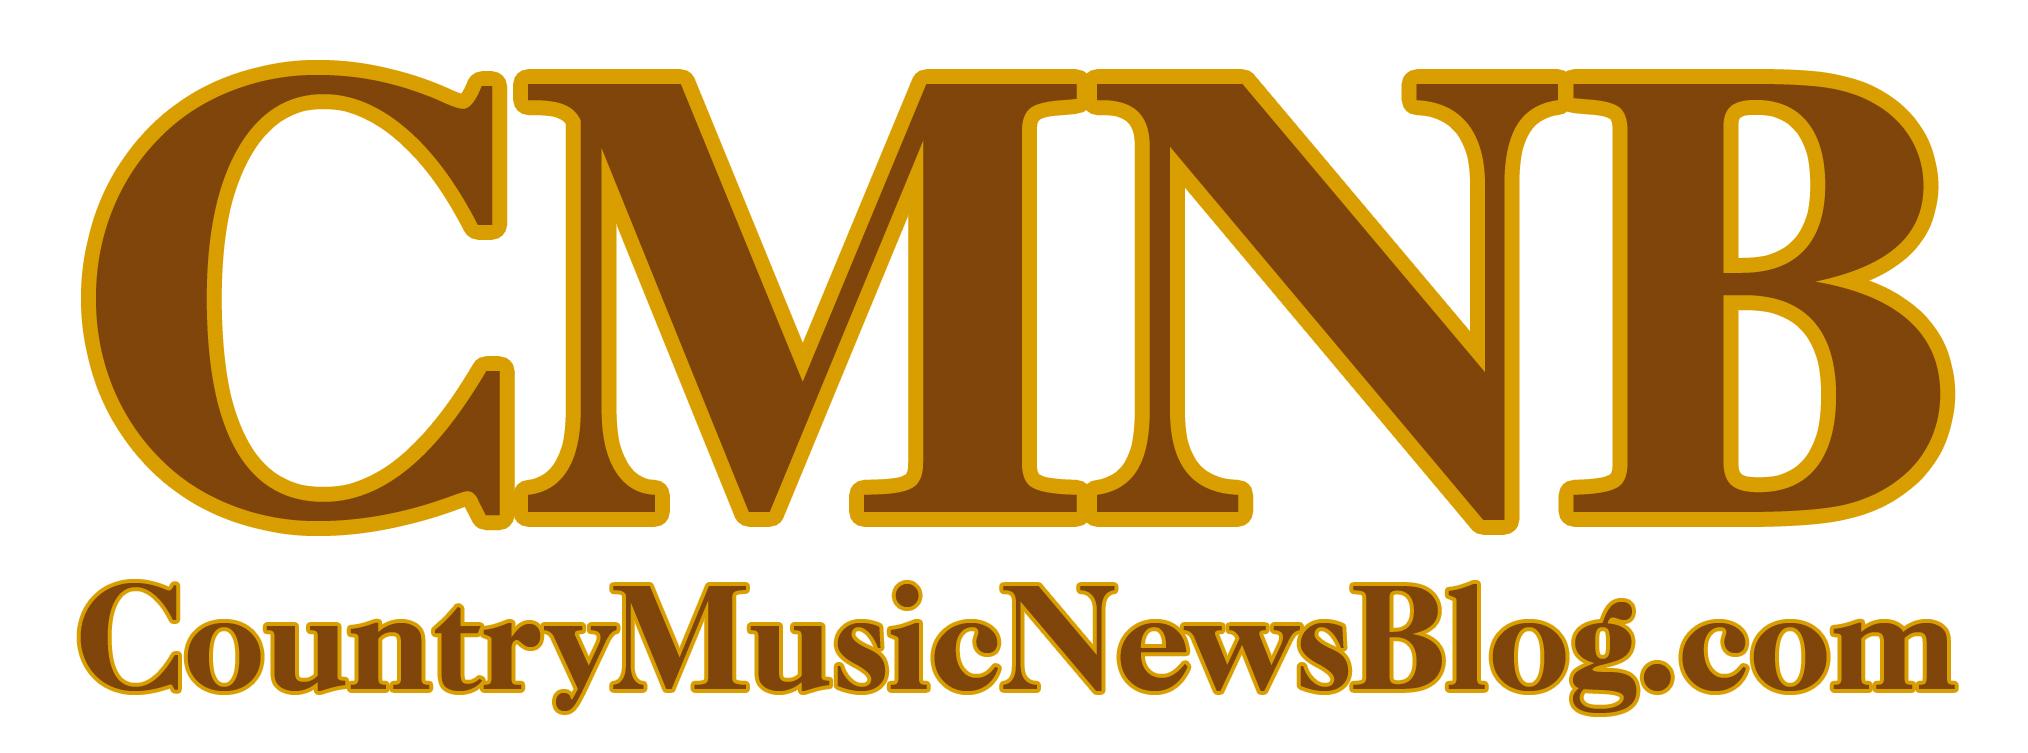 Country Music News Blog | CMNB